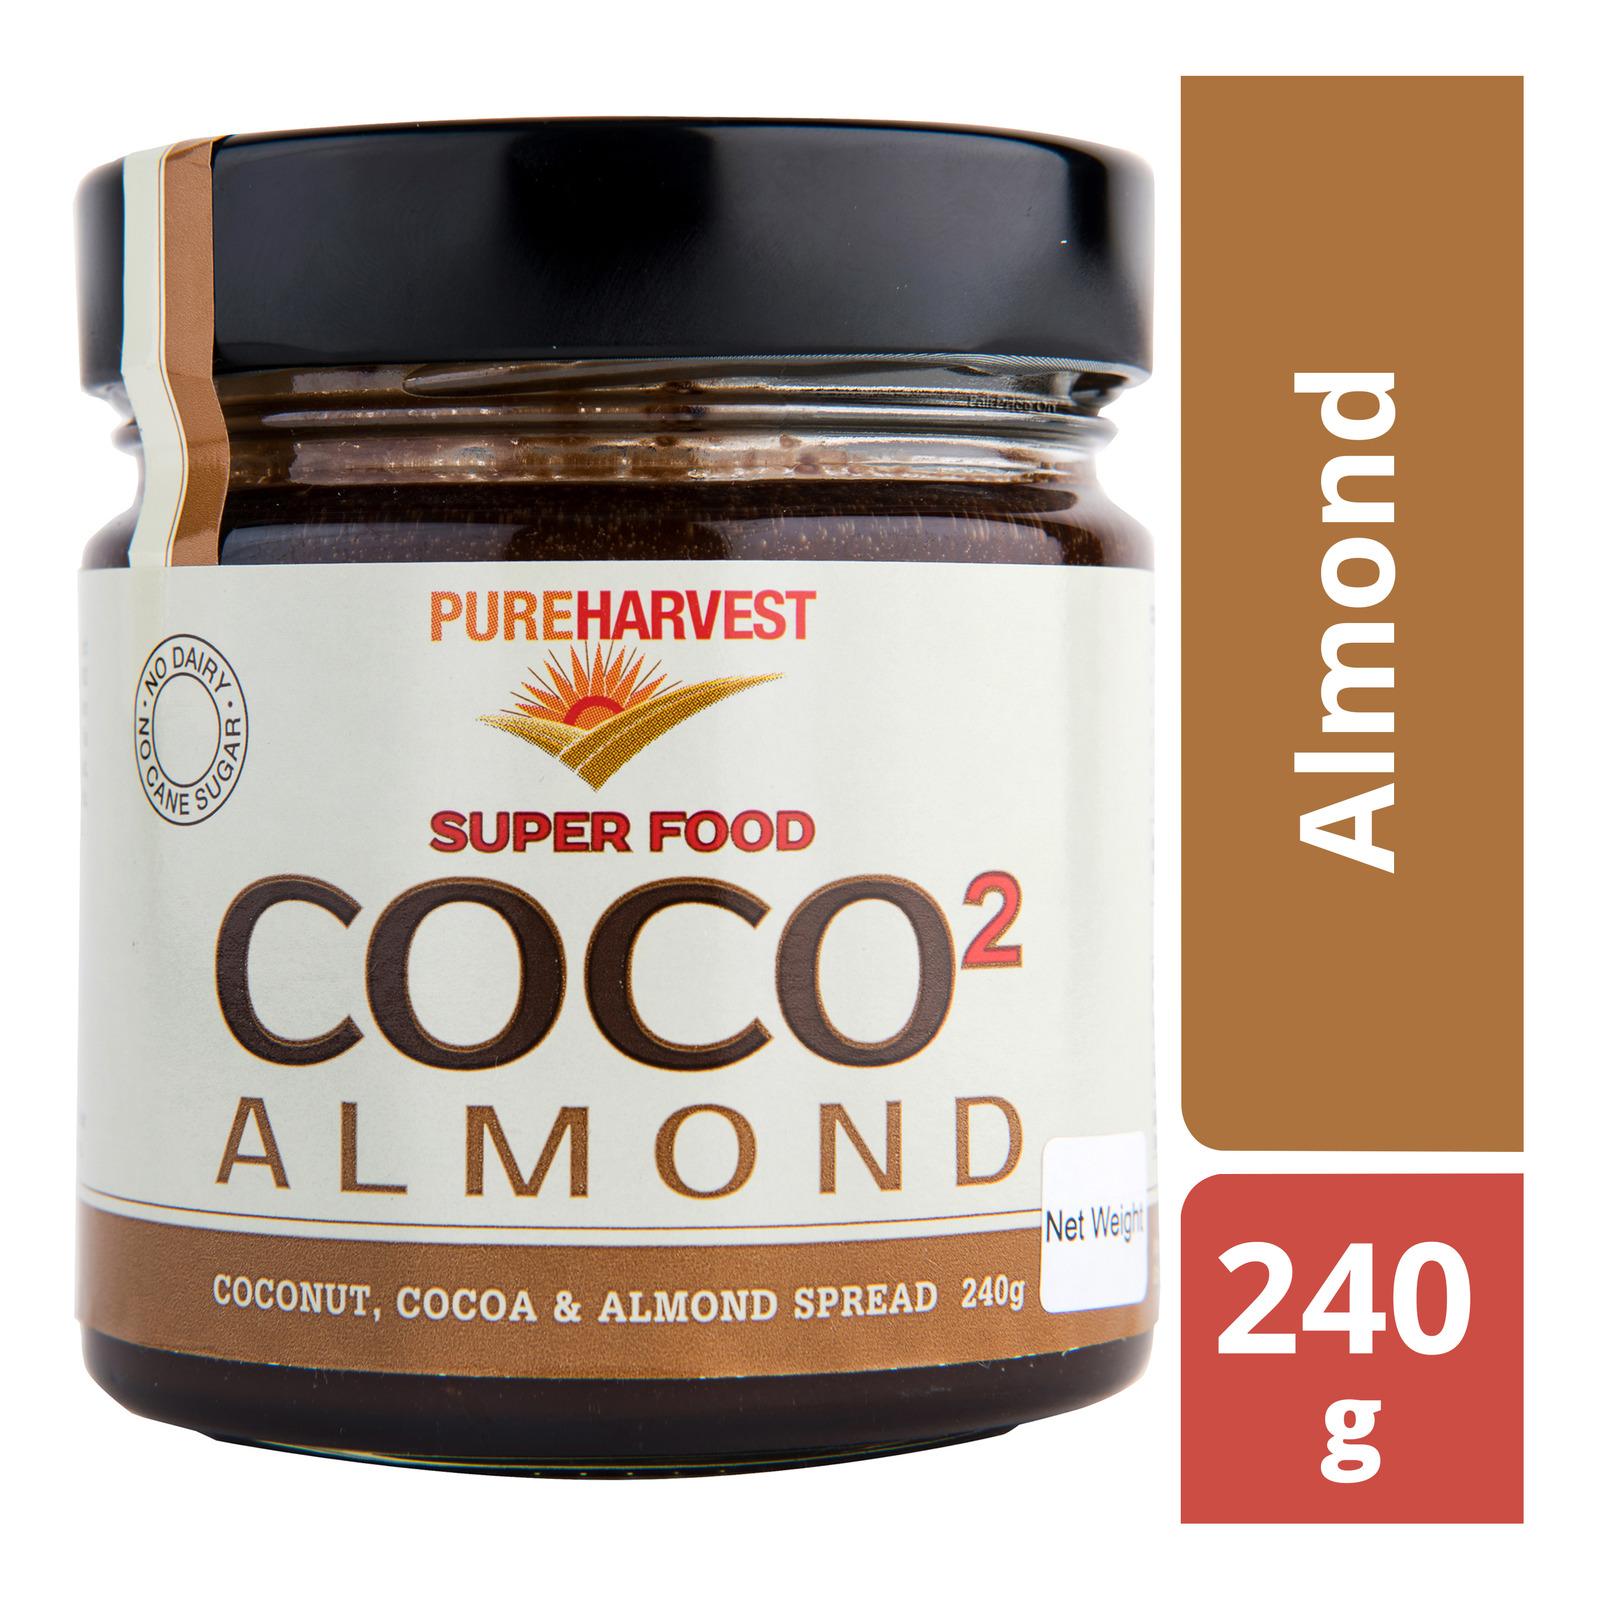 Pureharvest Super Food Coco2 Spread - Almond